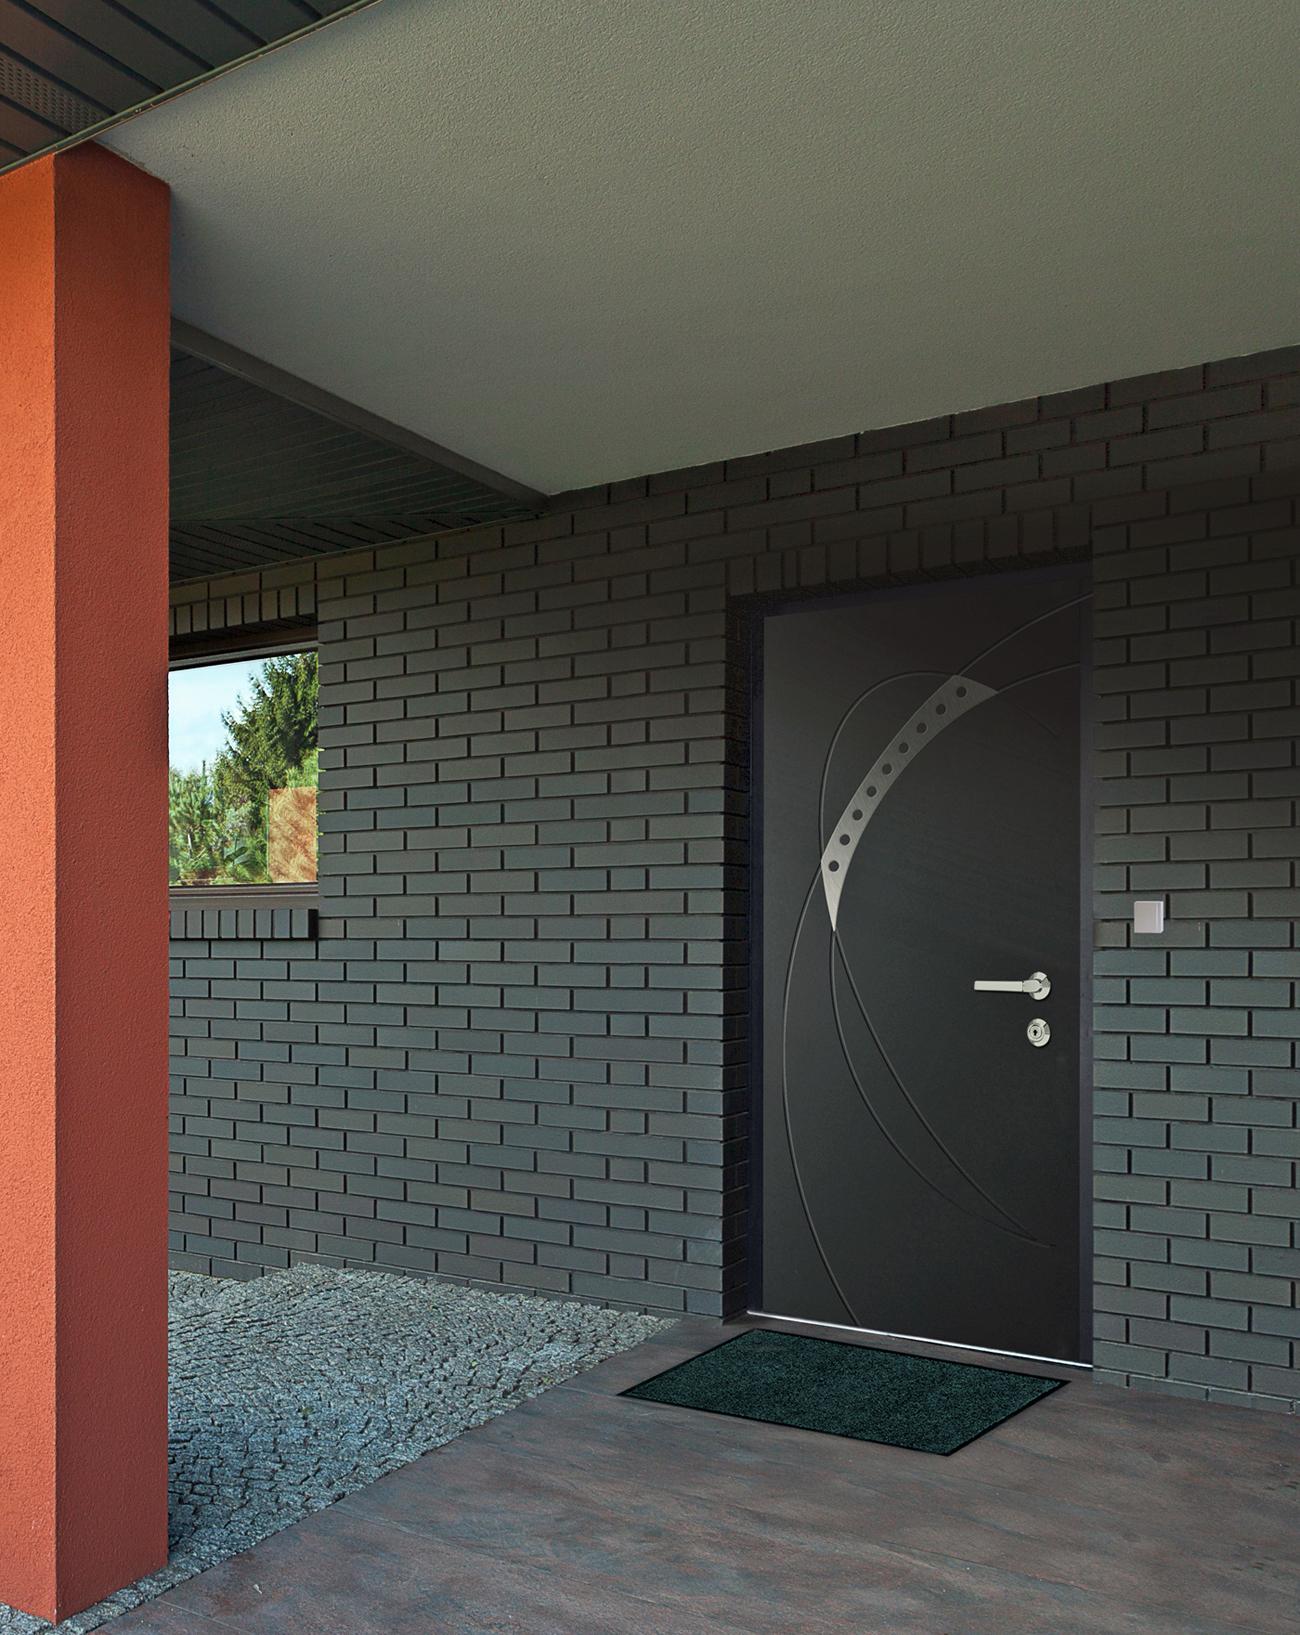 picard serrures compl te sa gamme de panneaux en aluminium. Black Bedroom Furniture Sets. Home Design Ideas